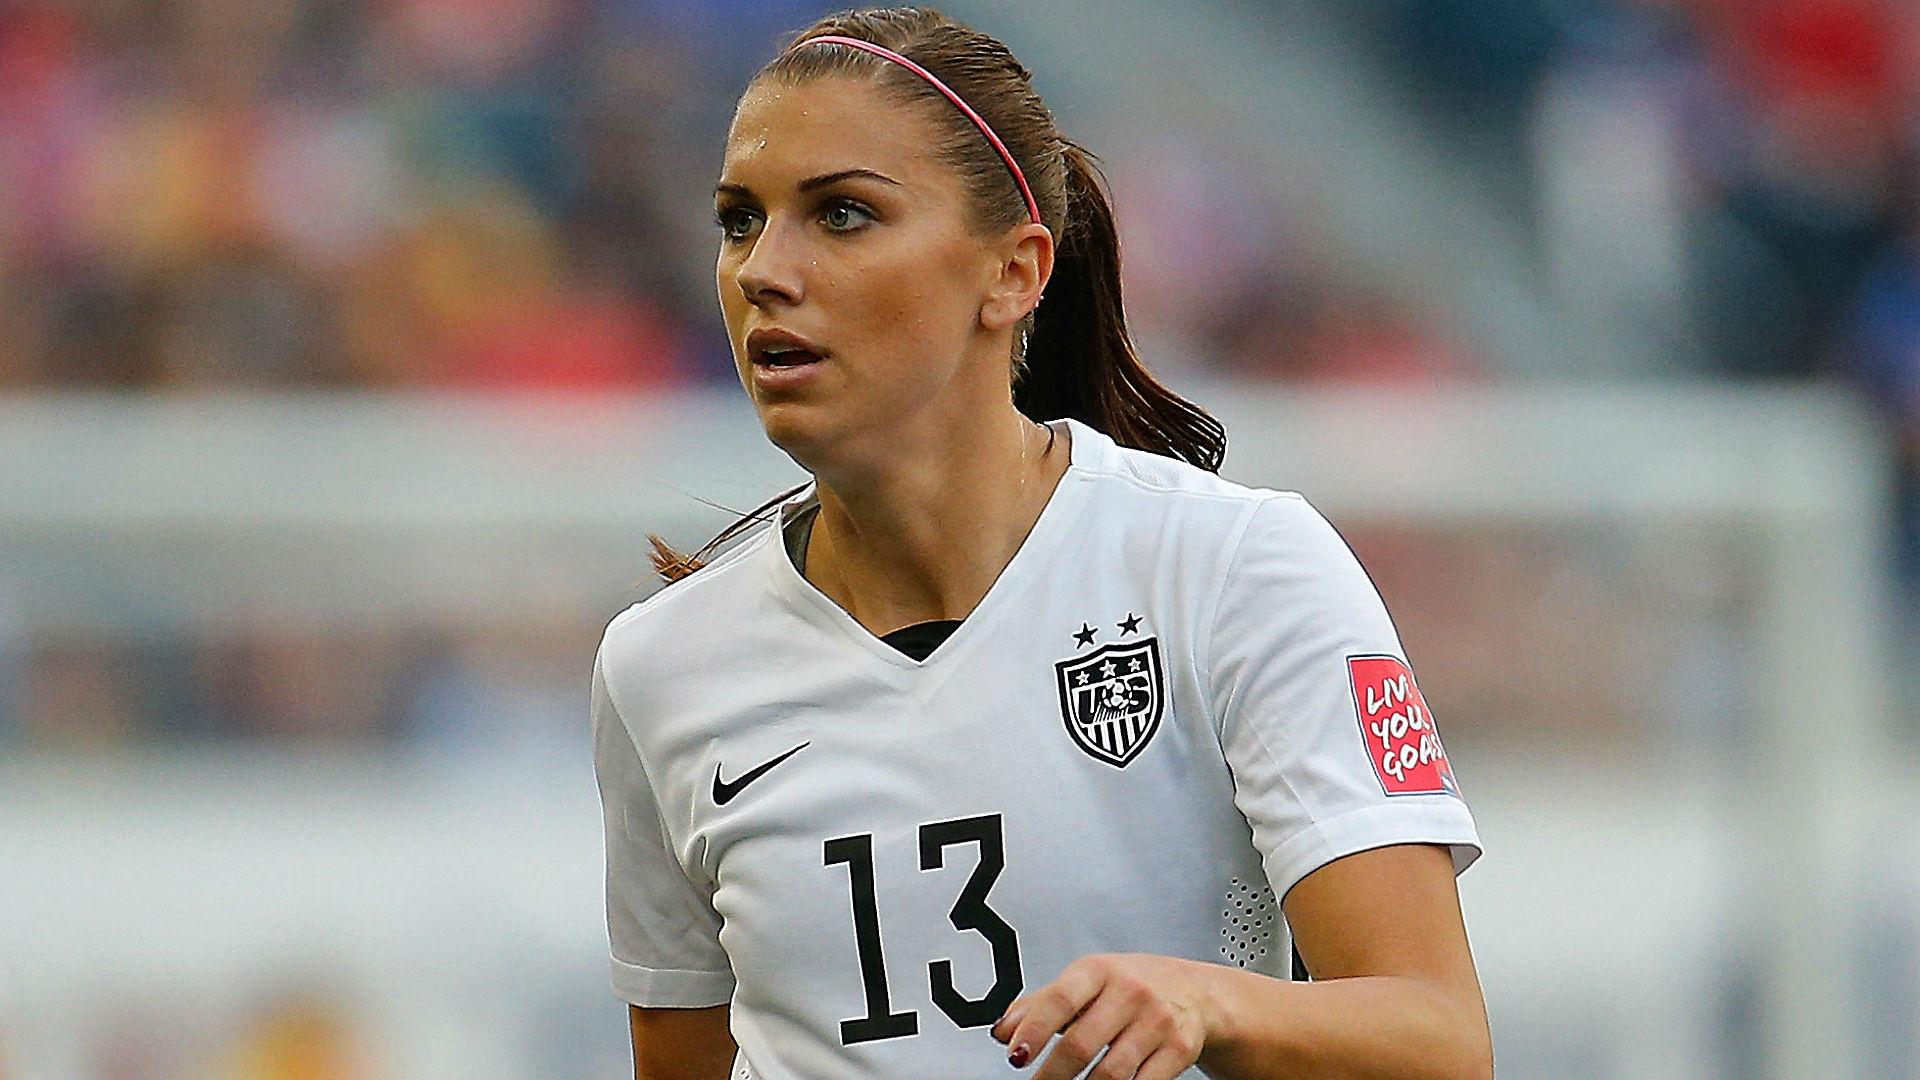 Cute Lady Wallpaper Hd Women S Soccer Stars Alex Morgan Abby Wambach Poised To